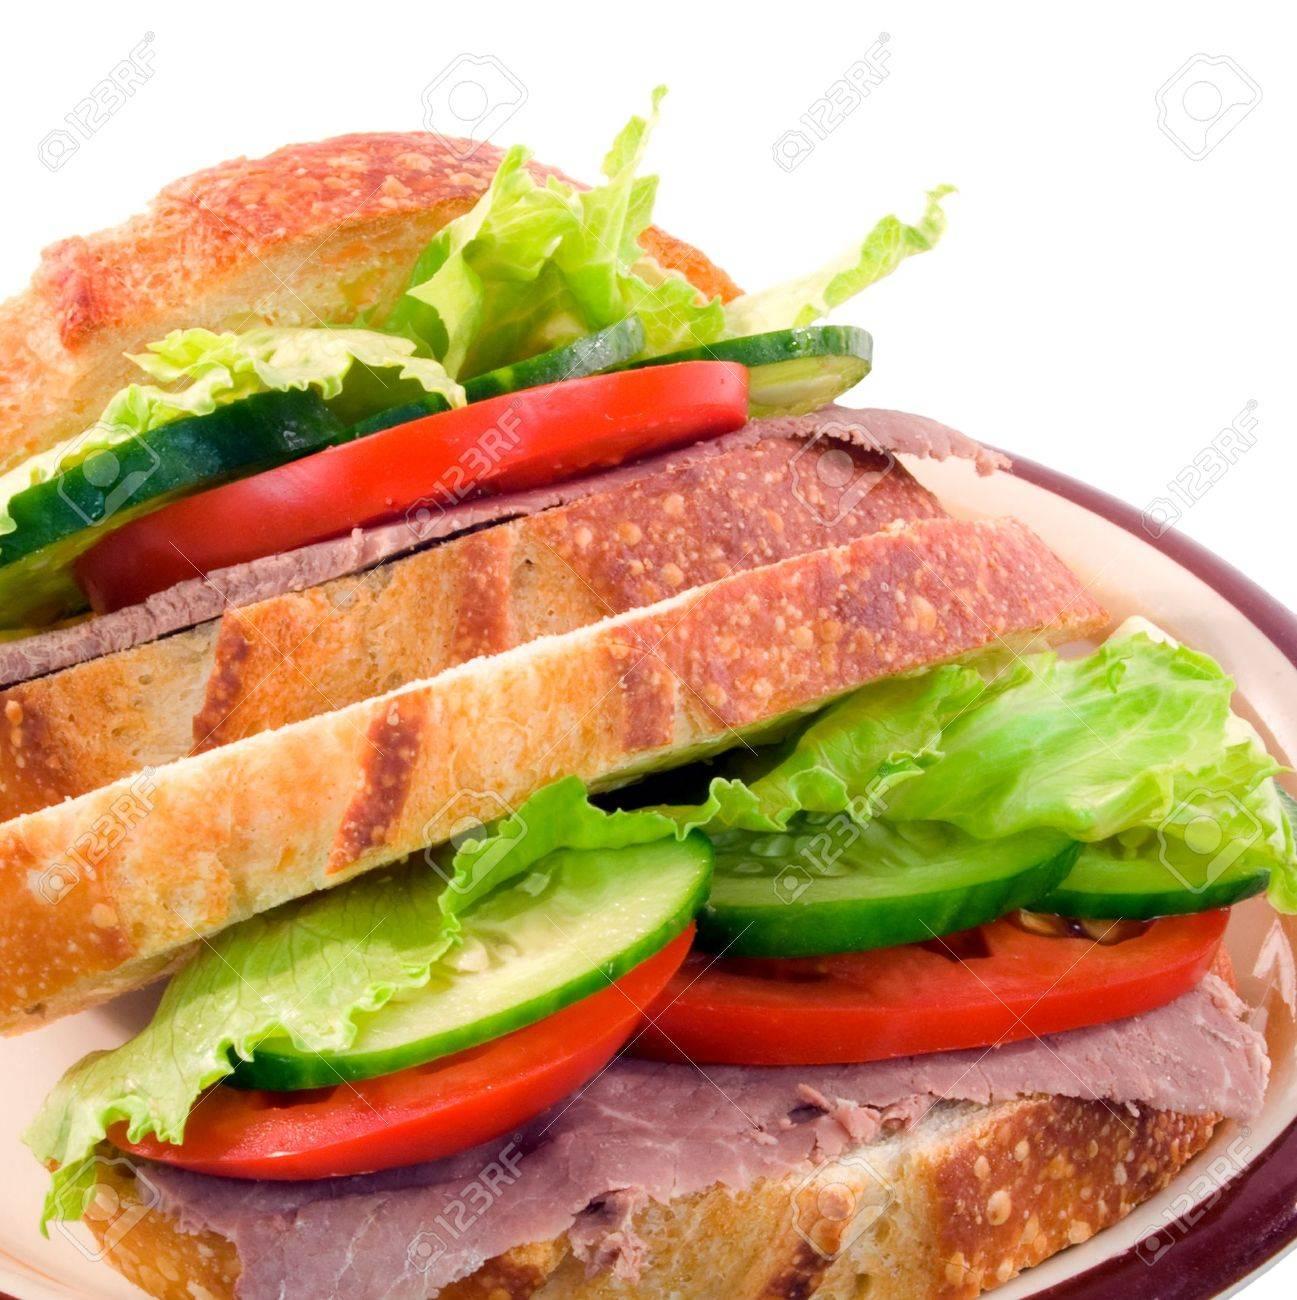 Salad sandwich on sourdough bread on white background Stock Photo - 2779956